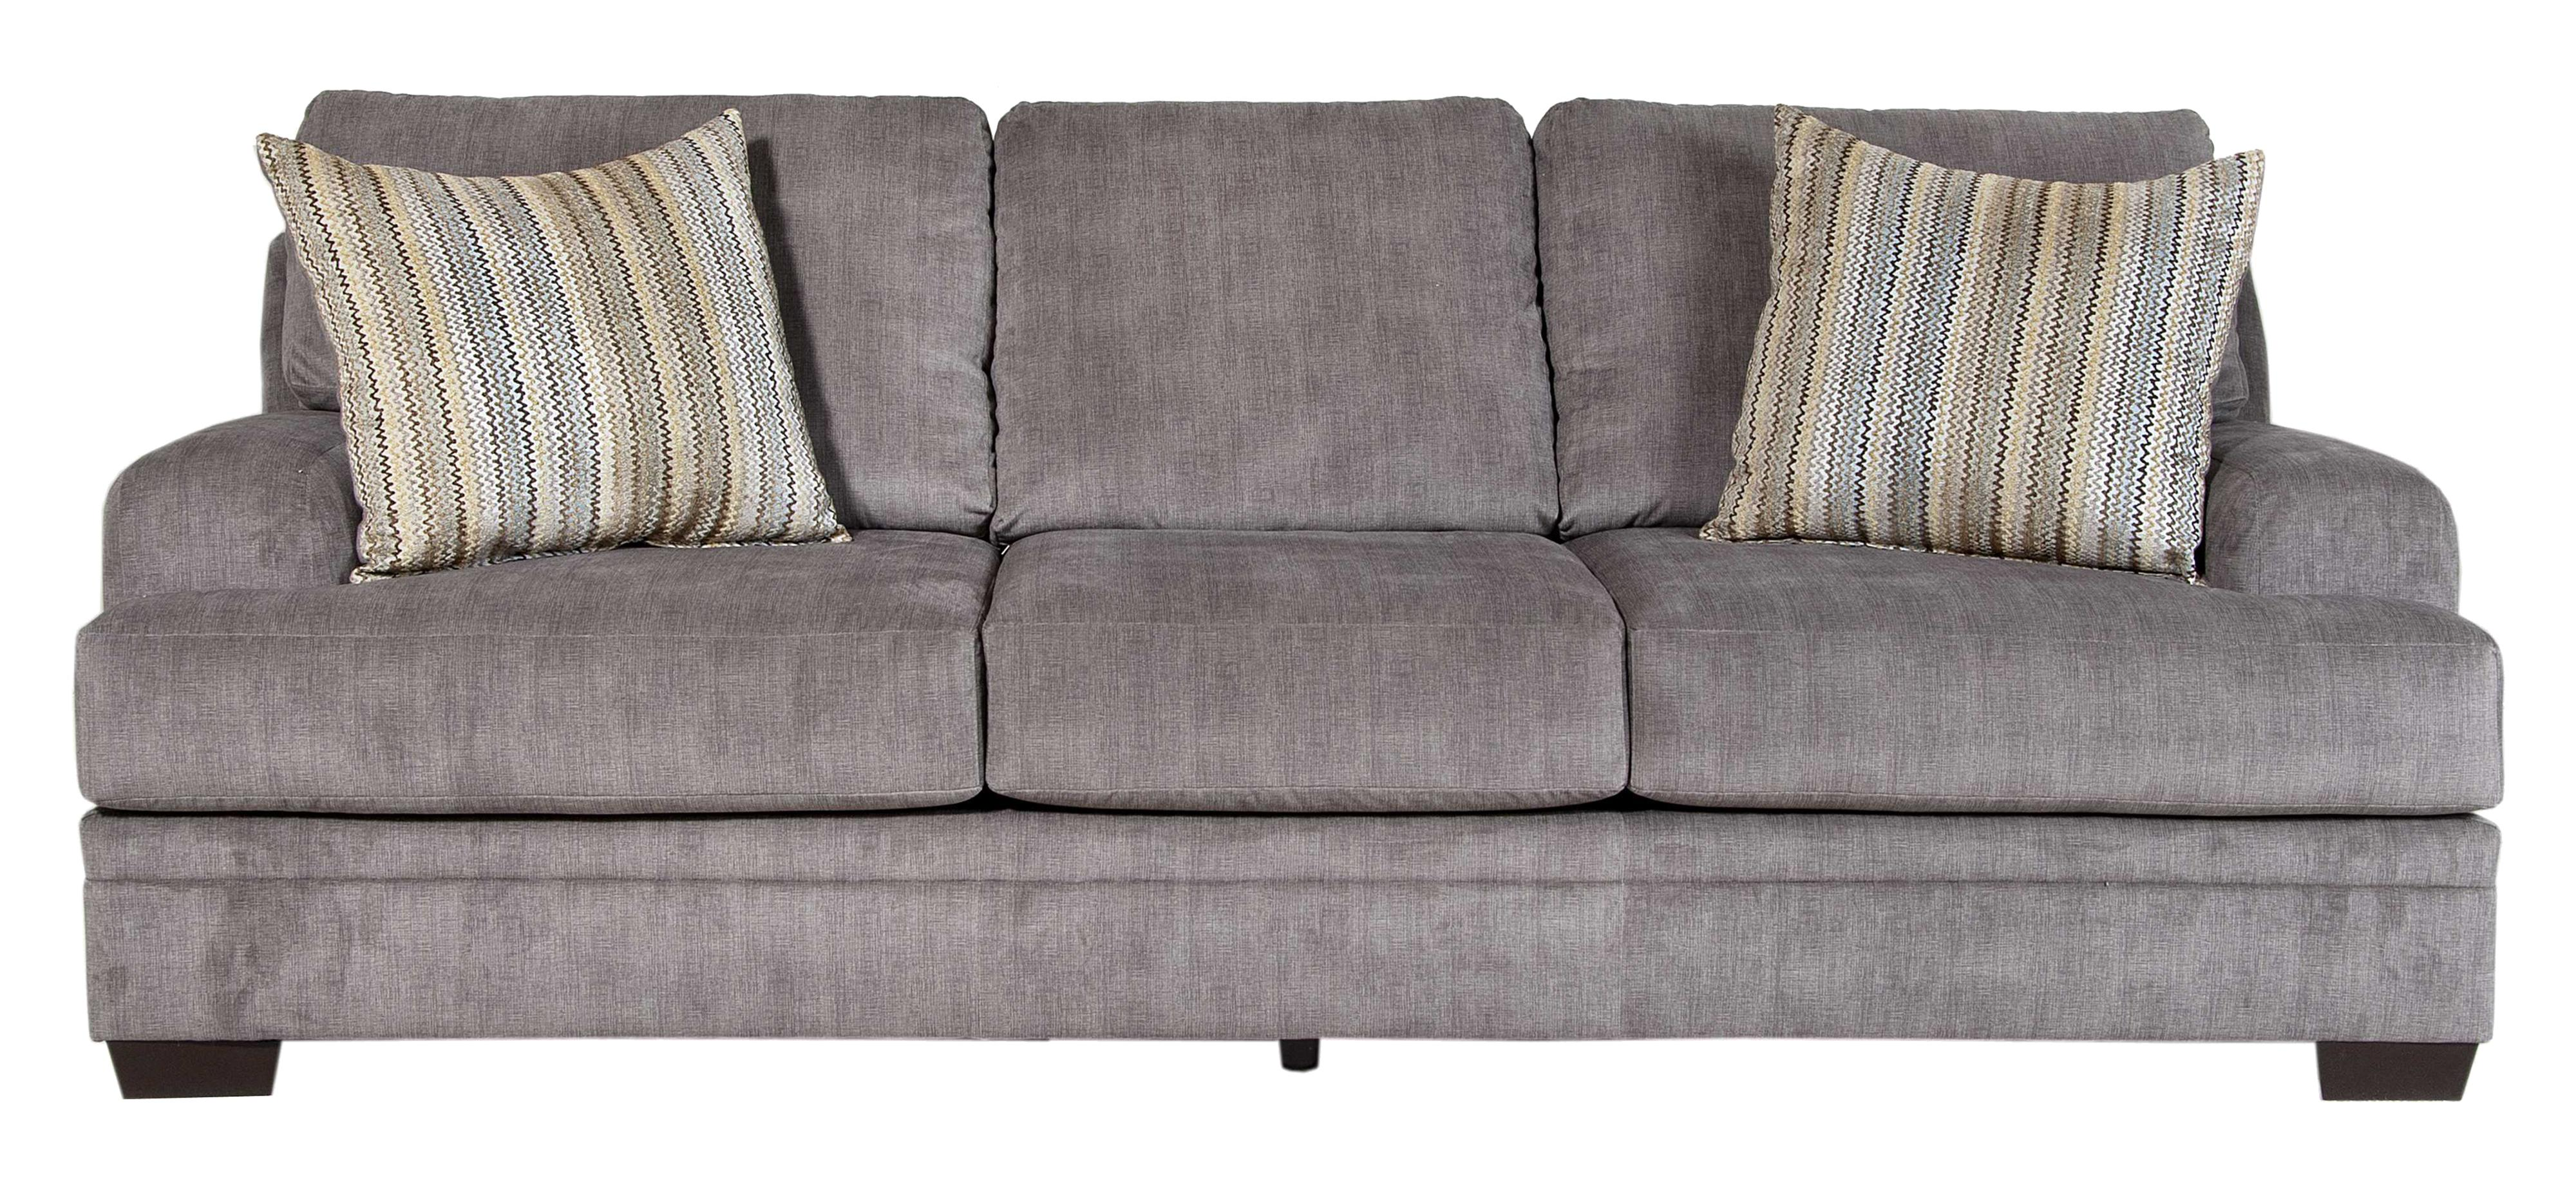 8800 Sofa by Hughes Furniture at Lapeer Furniture & Mattress Center